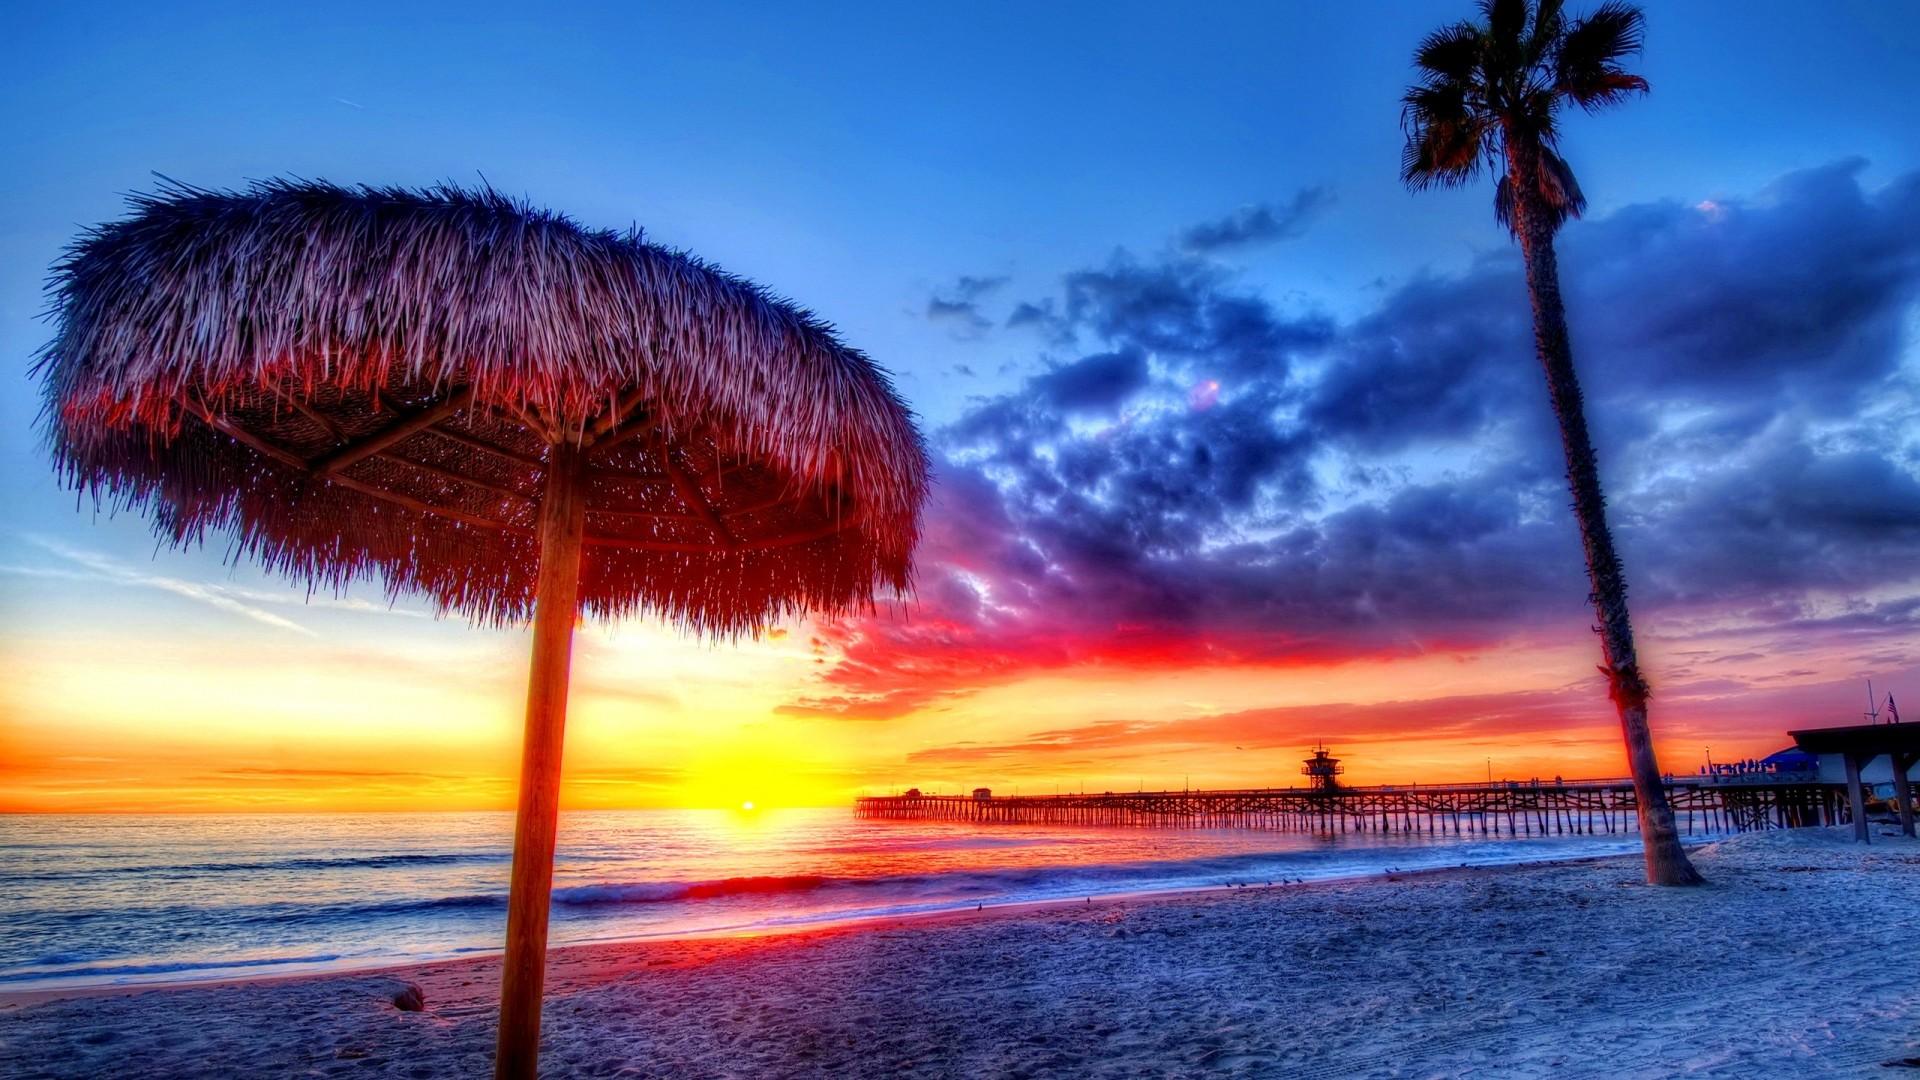 Wallpaper beach, tropics, sea, sand, palm trees, sunset, beautiful